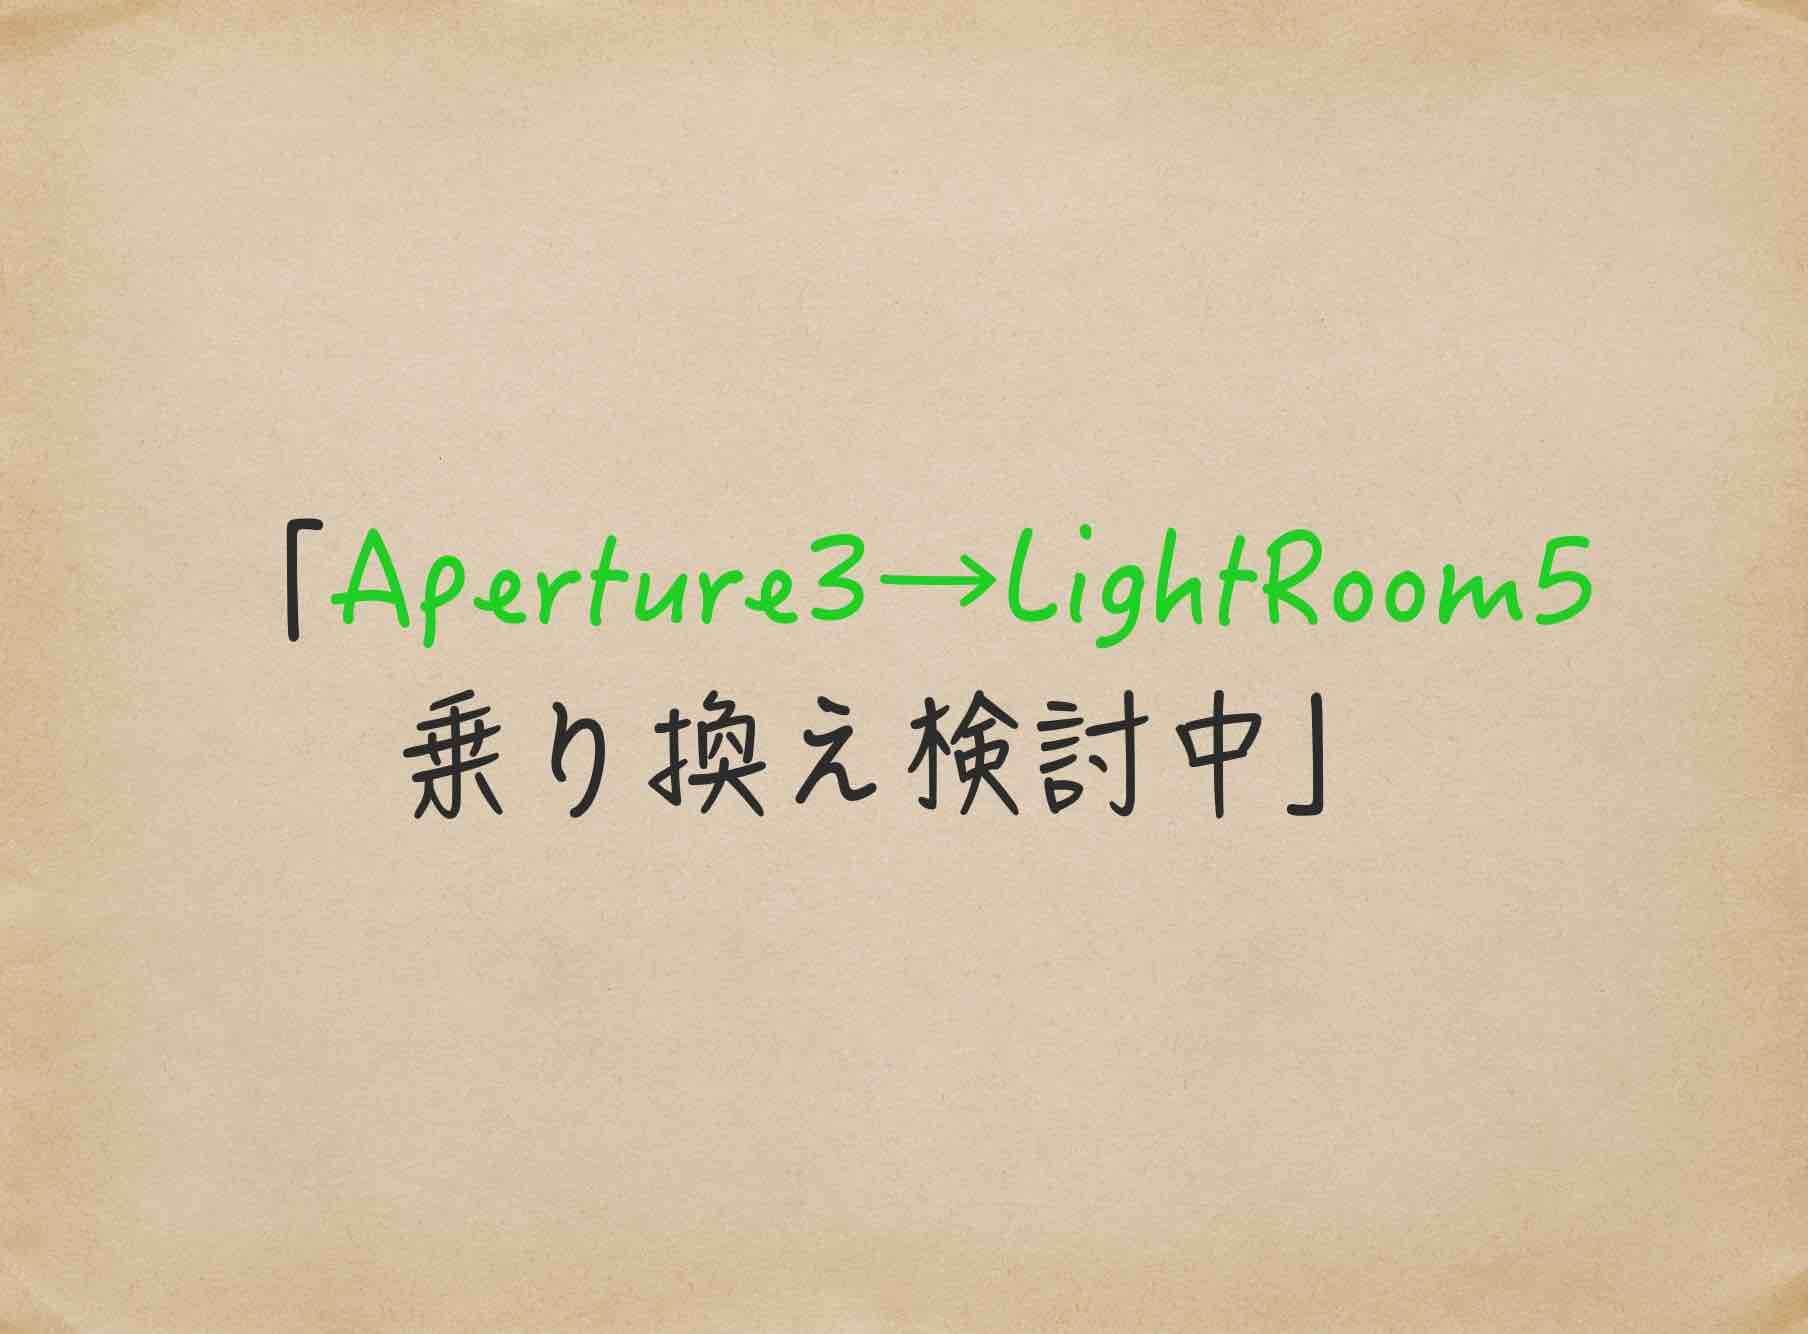 Aperture3からLightroom5へ乗り換え検討中